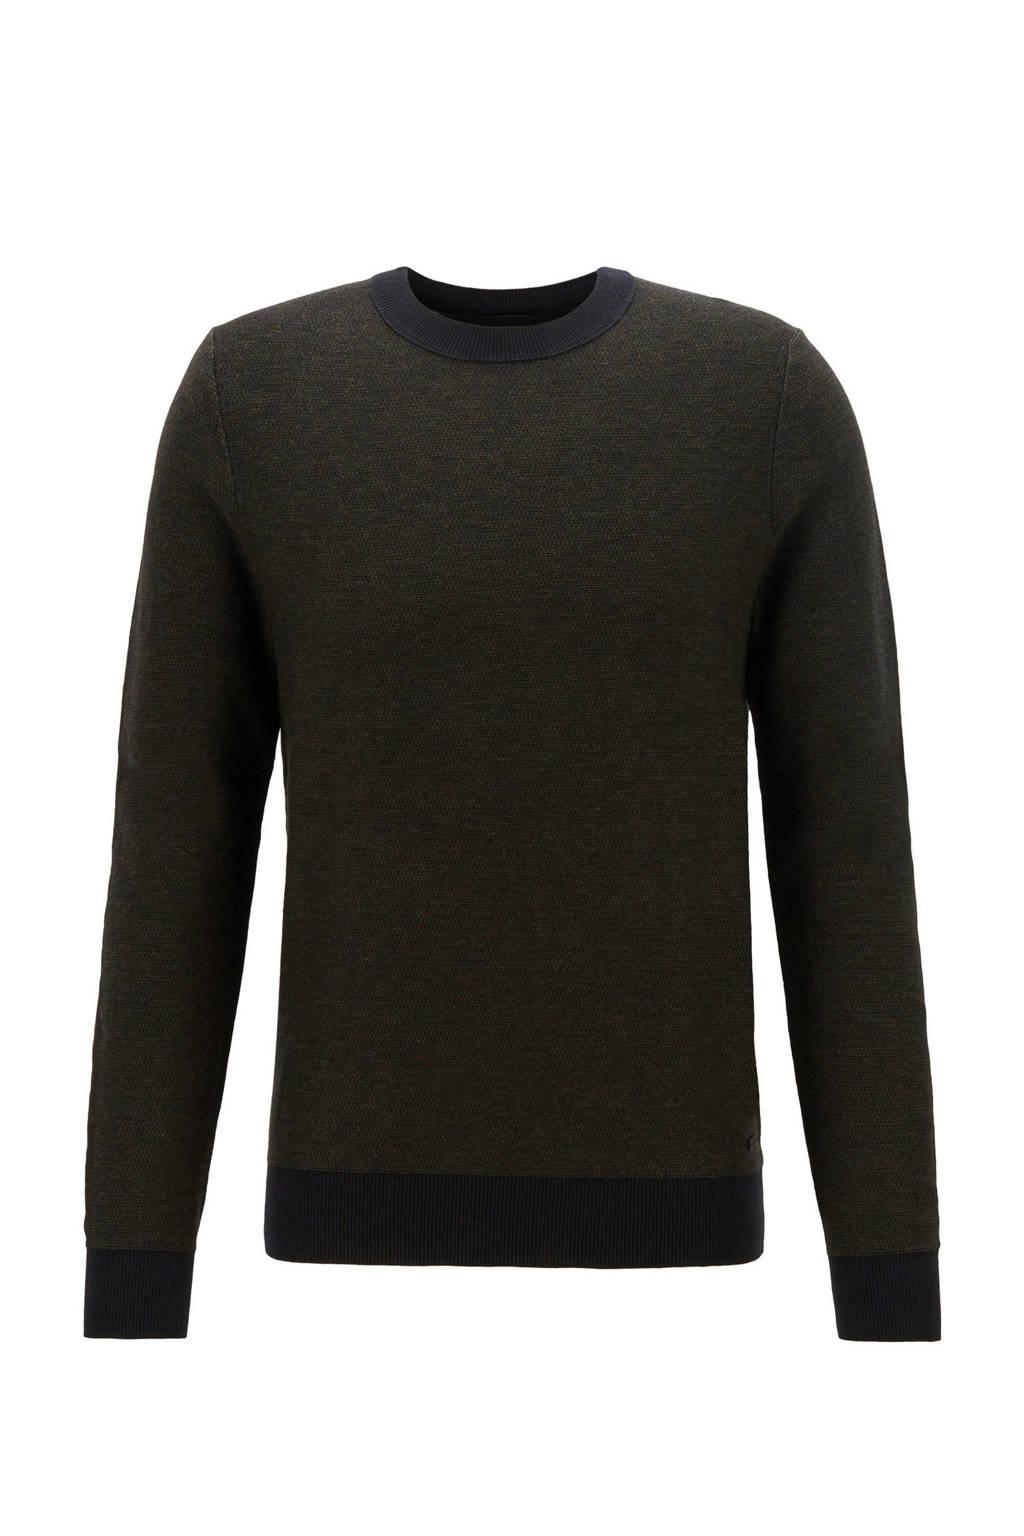 BOSS Casual gemêleerde trui met wol zwart, Zwart